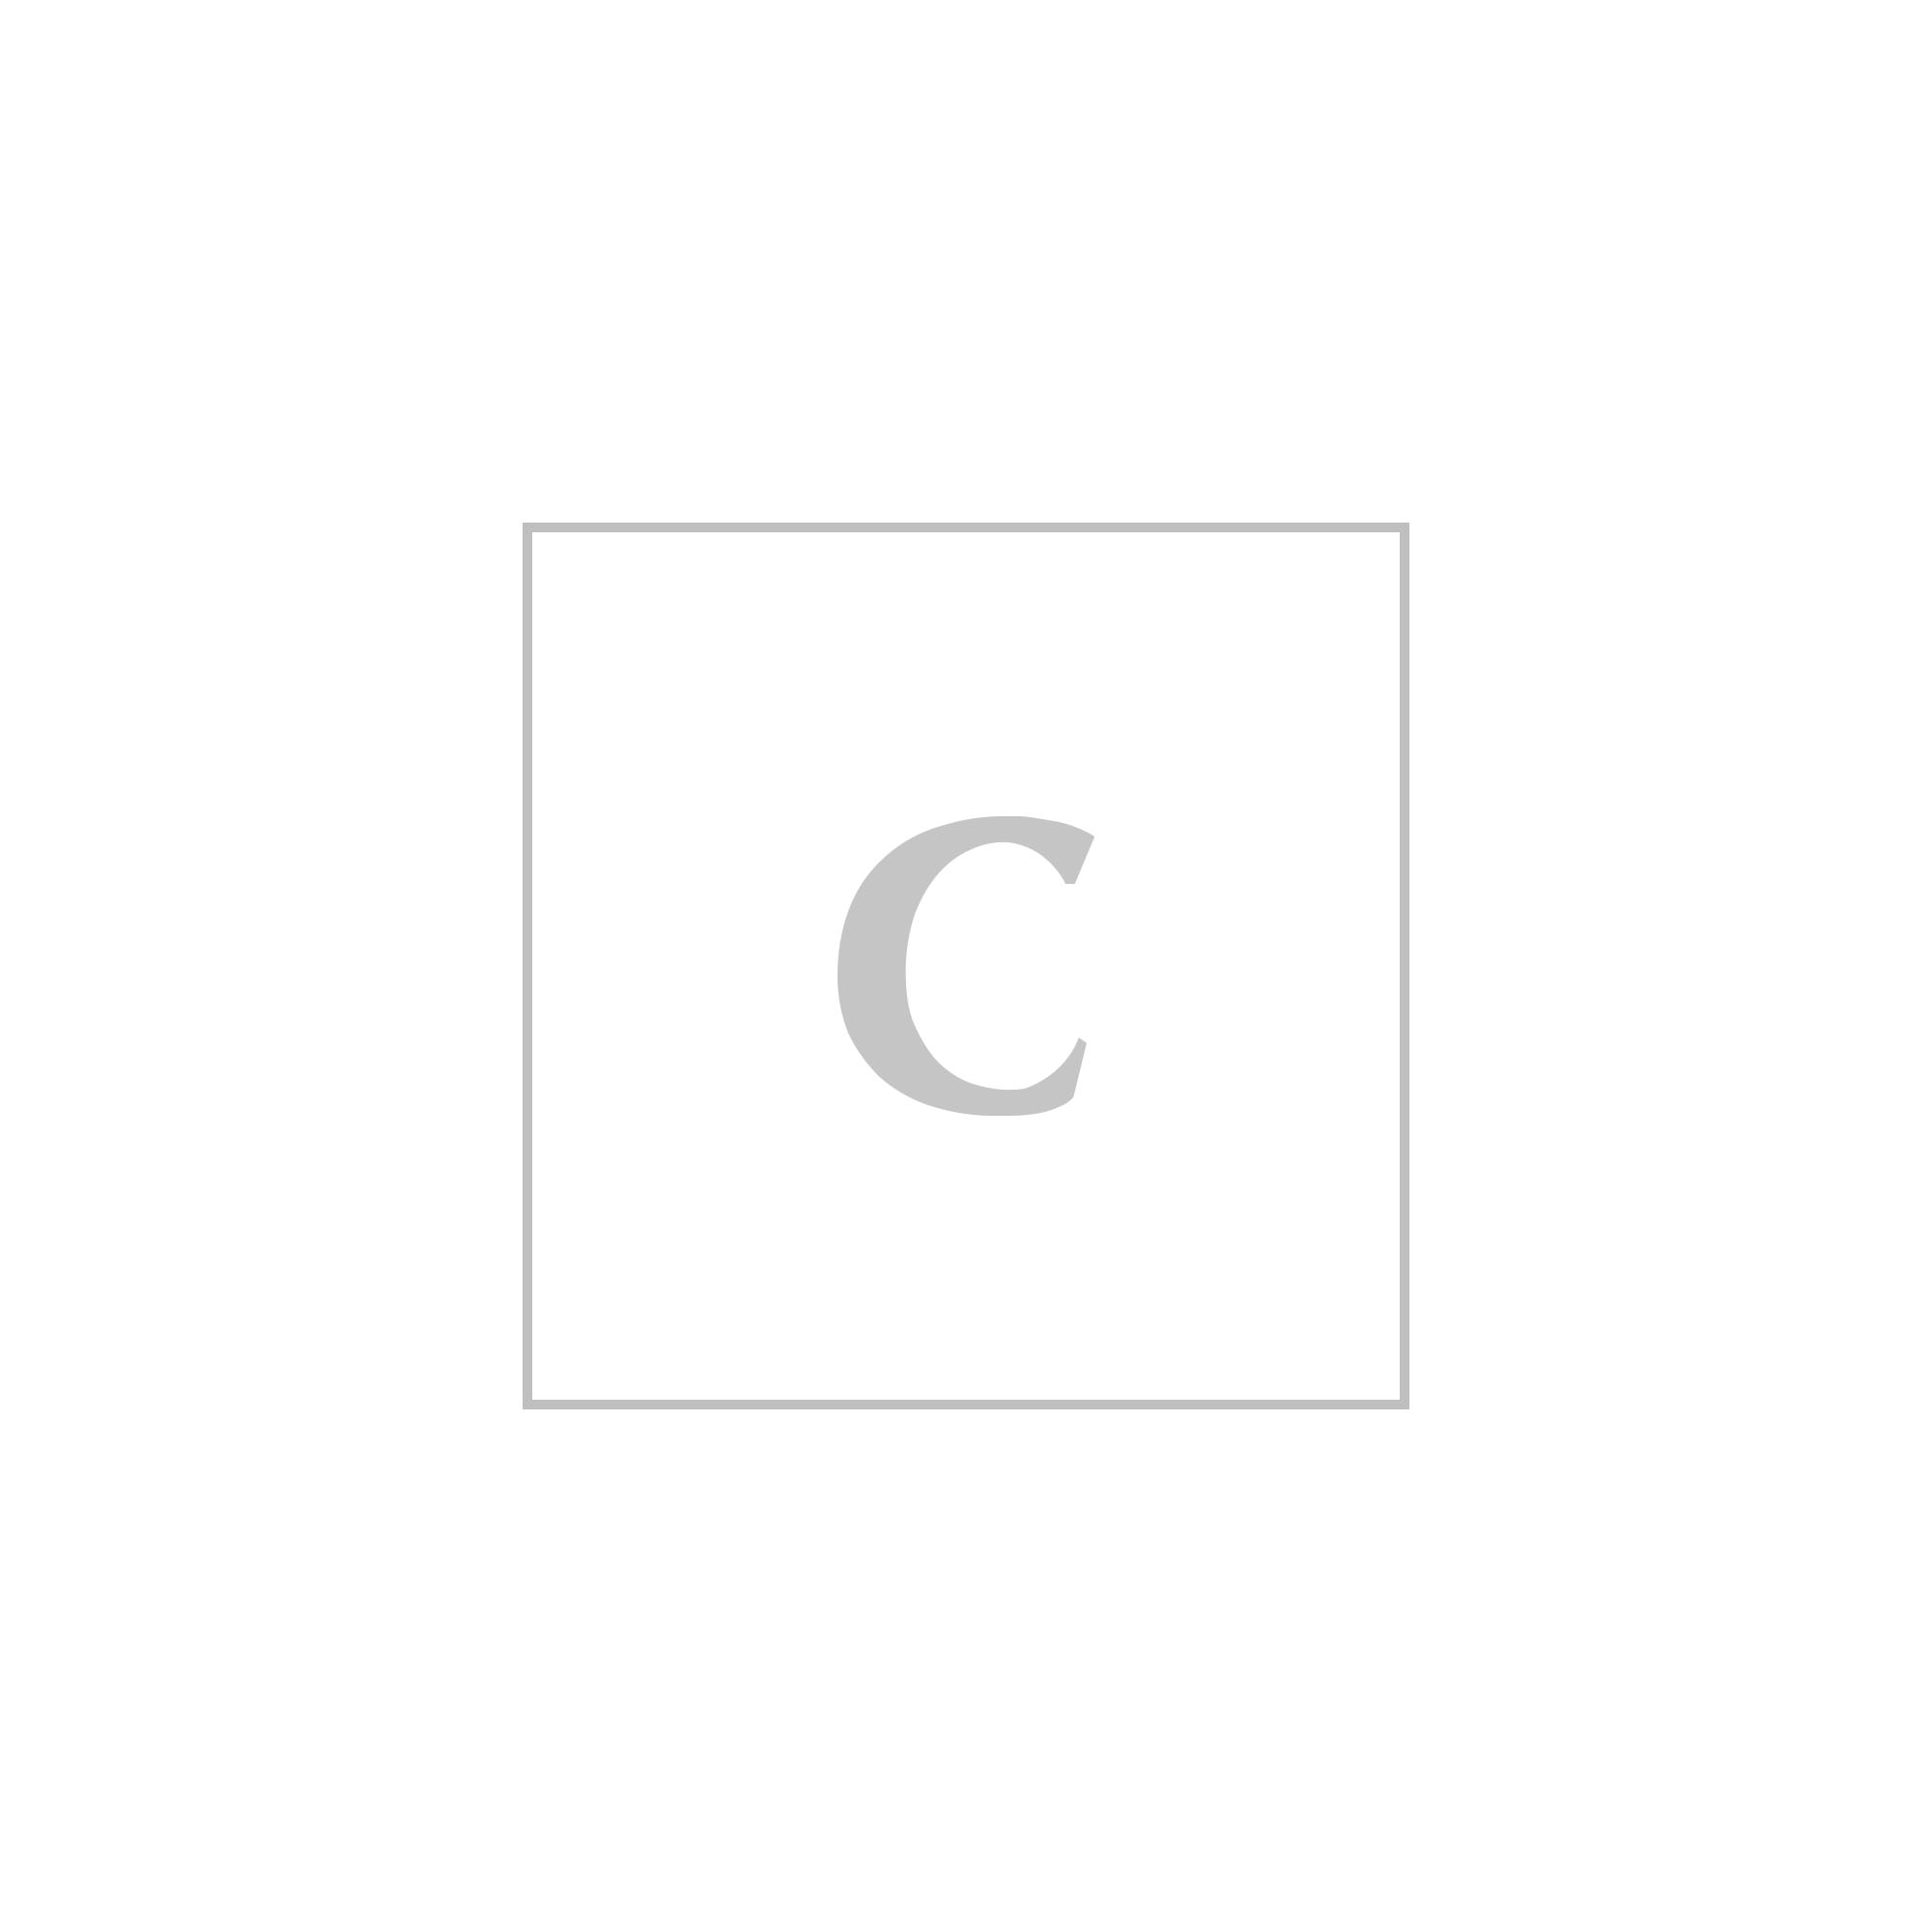 Dolce & gabbana portafoglio vitello palmellato patch stilisti